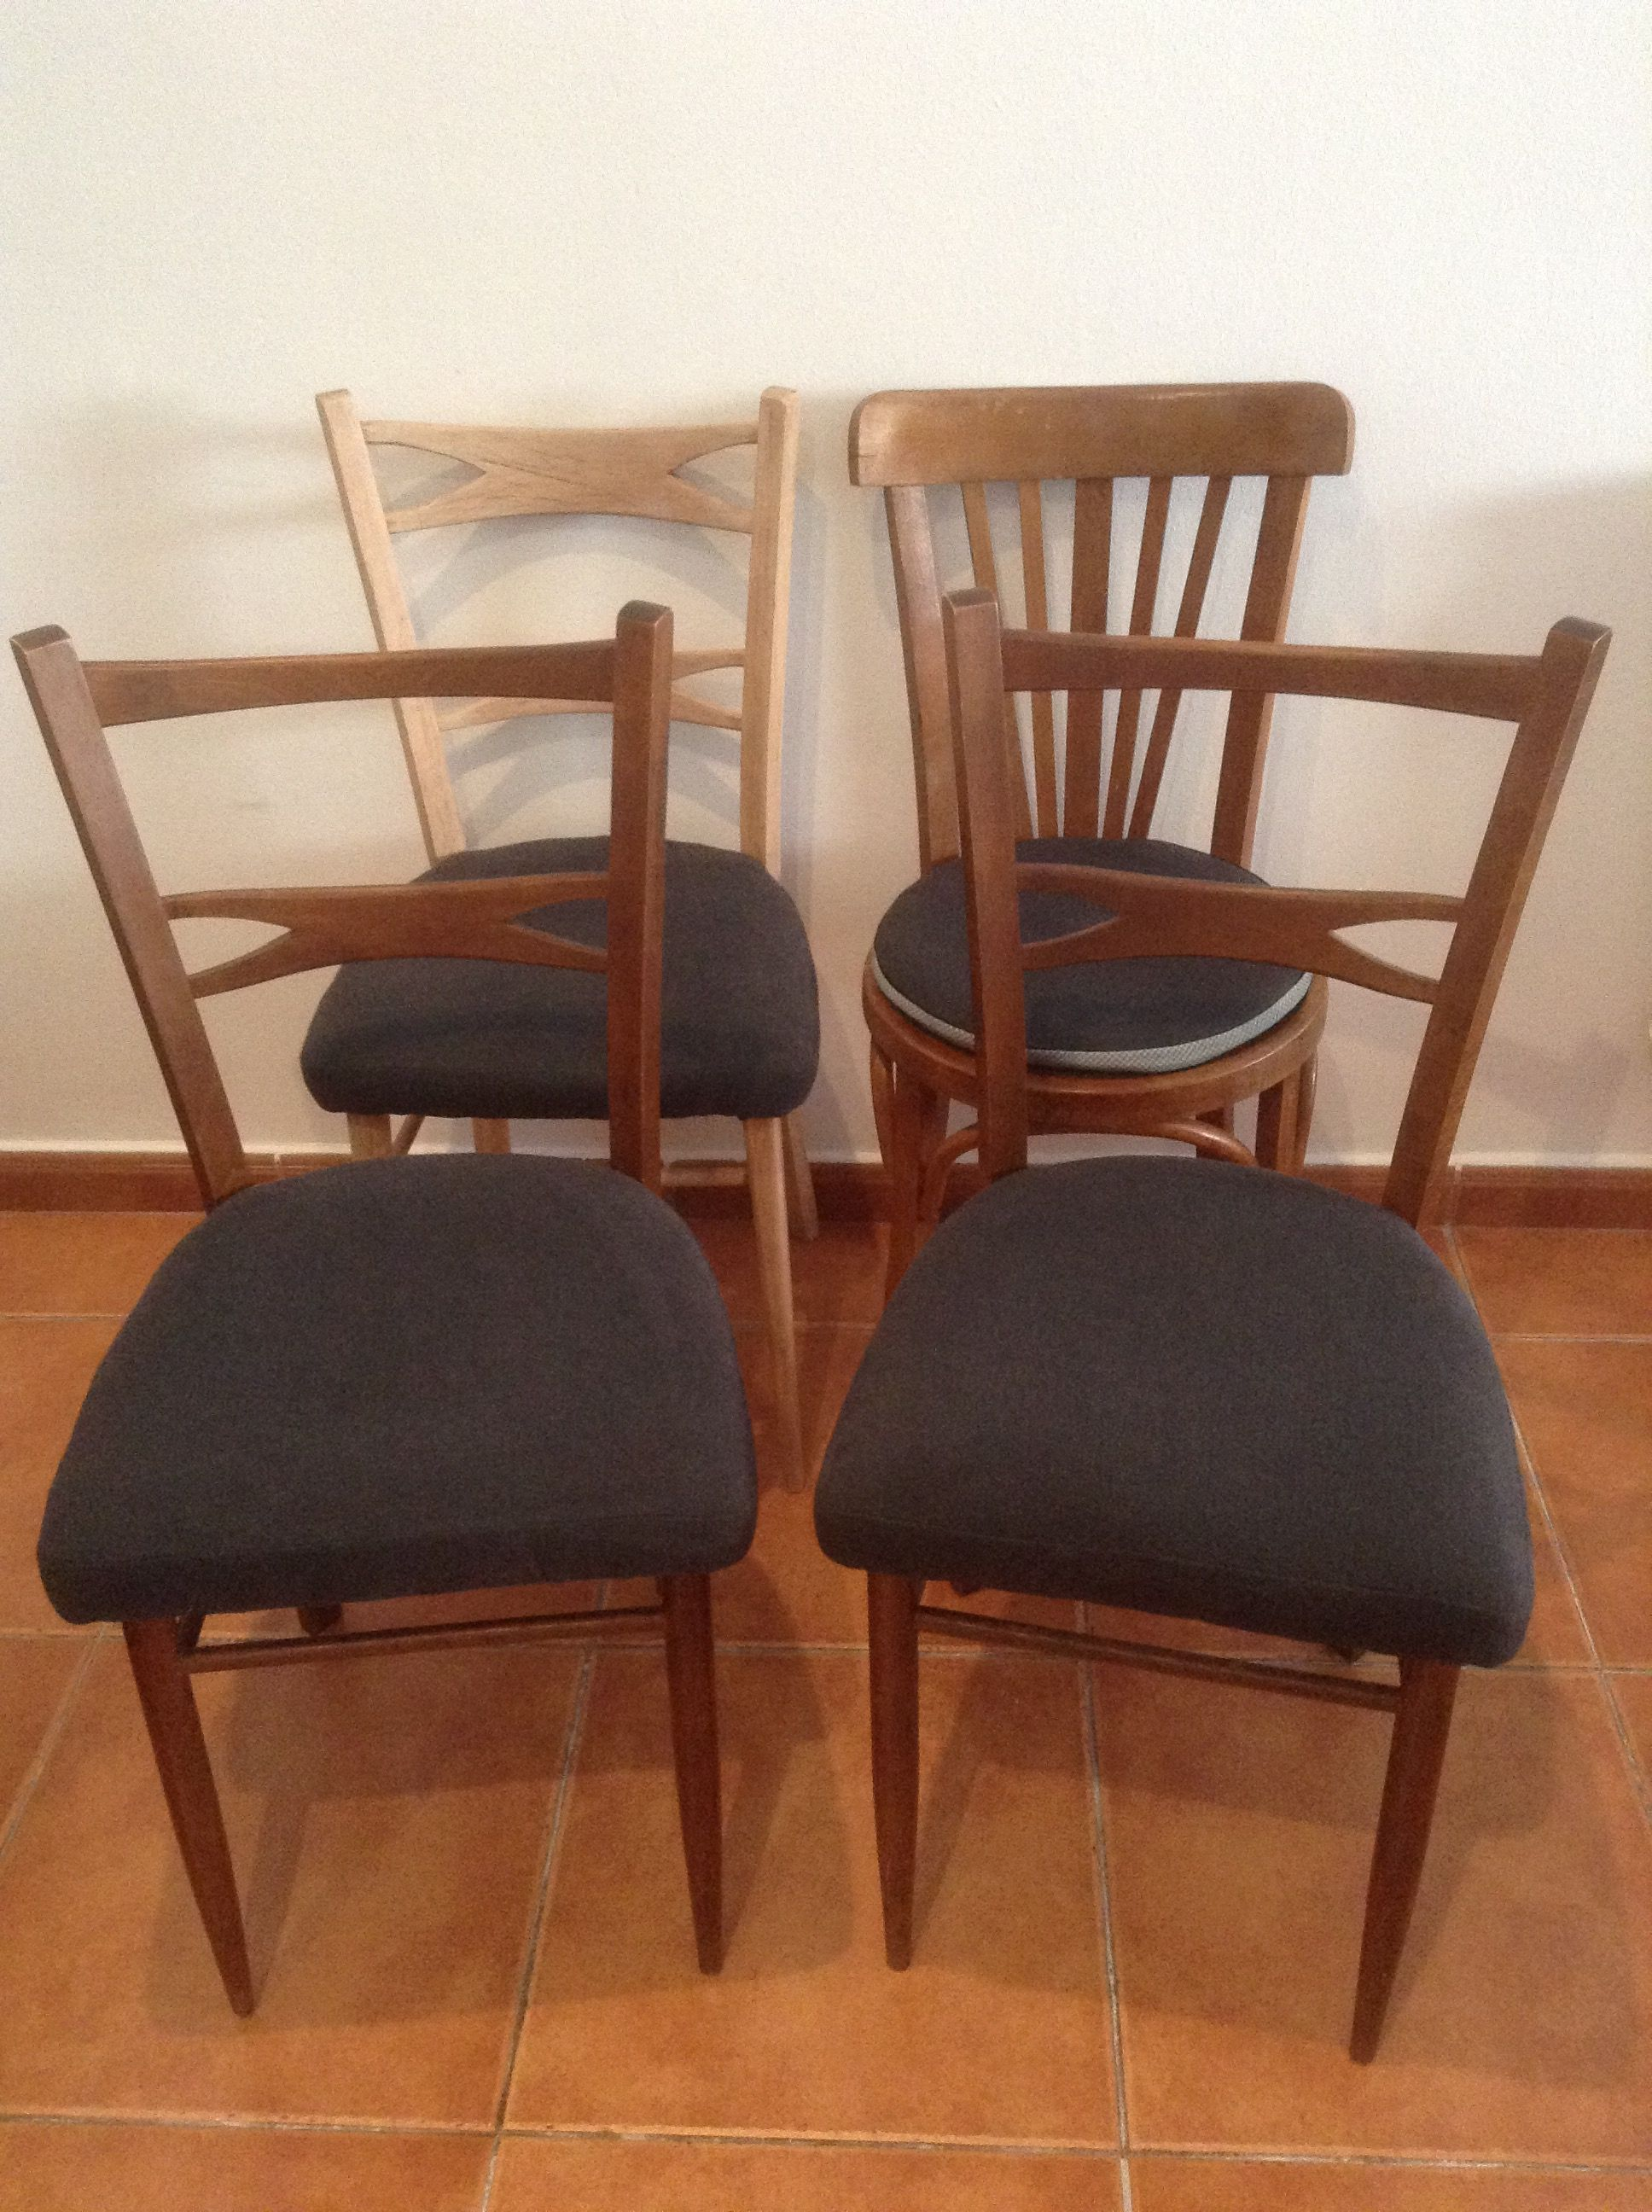 Refurnished Mocholi Chairs Matching Mismatched Chairs Mid  # Muebles Mocholi